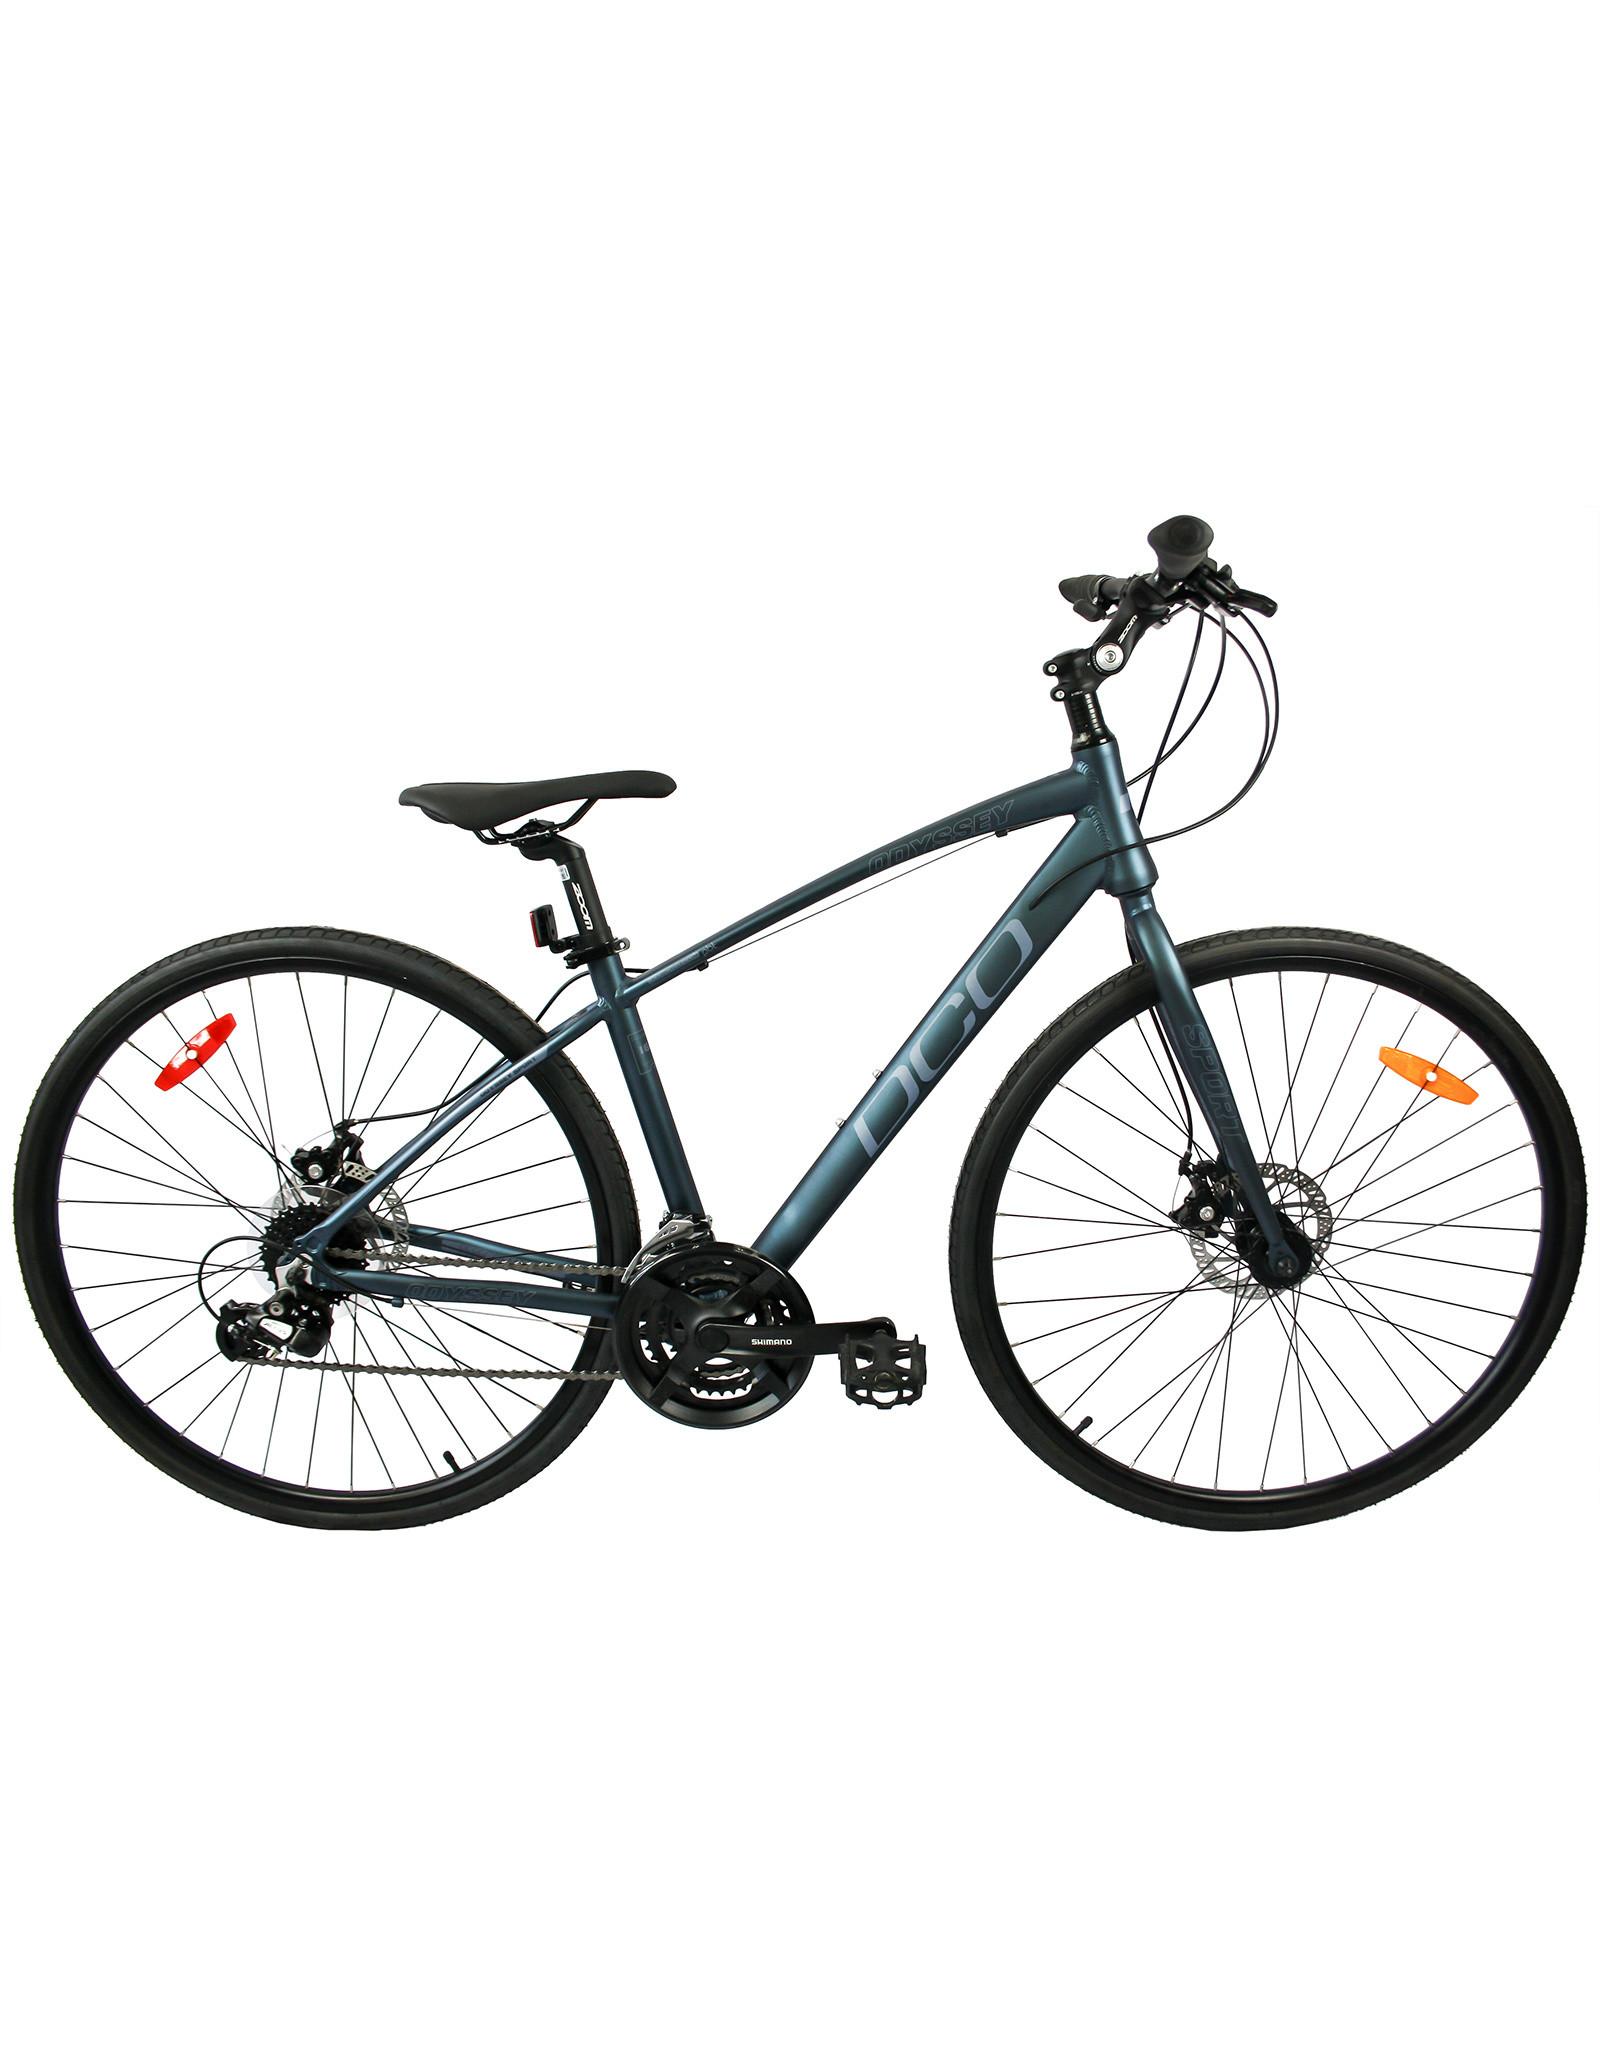 DCO DCO ODYSSEY SPORT dark teal mat grey hybrid bike